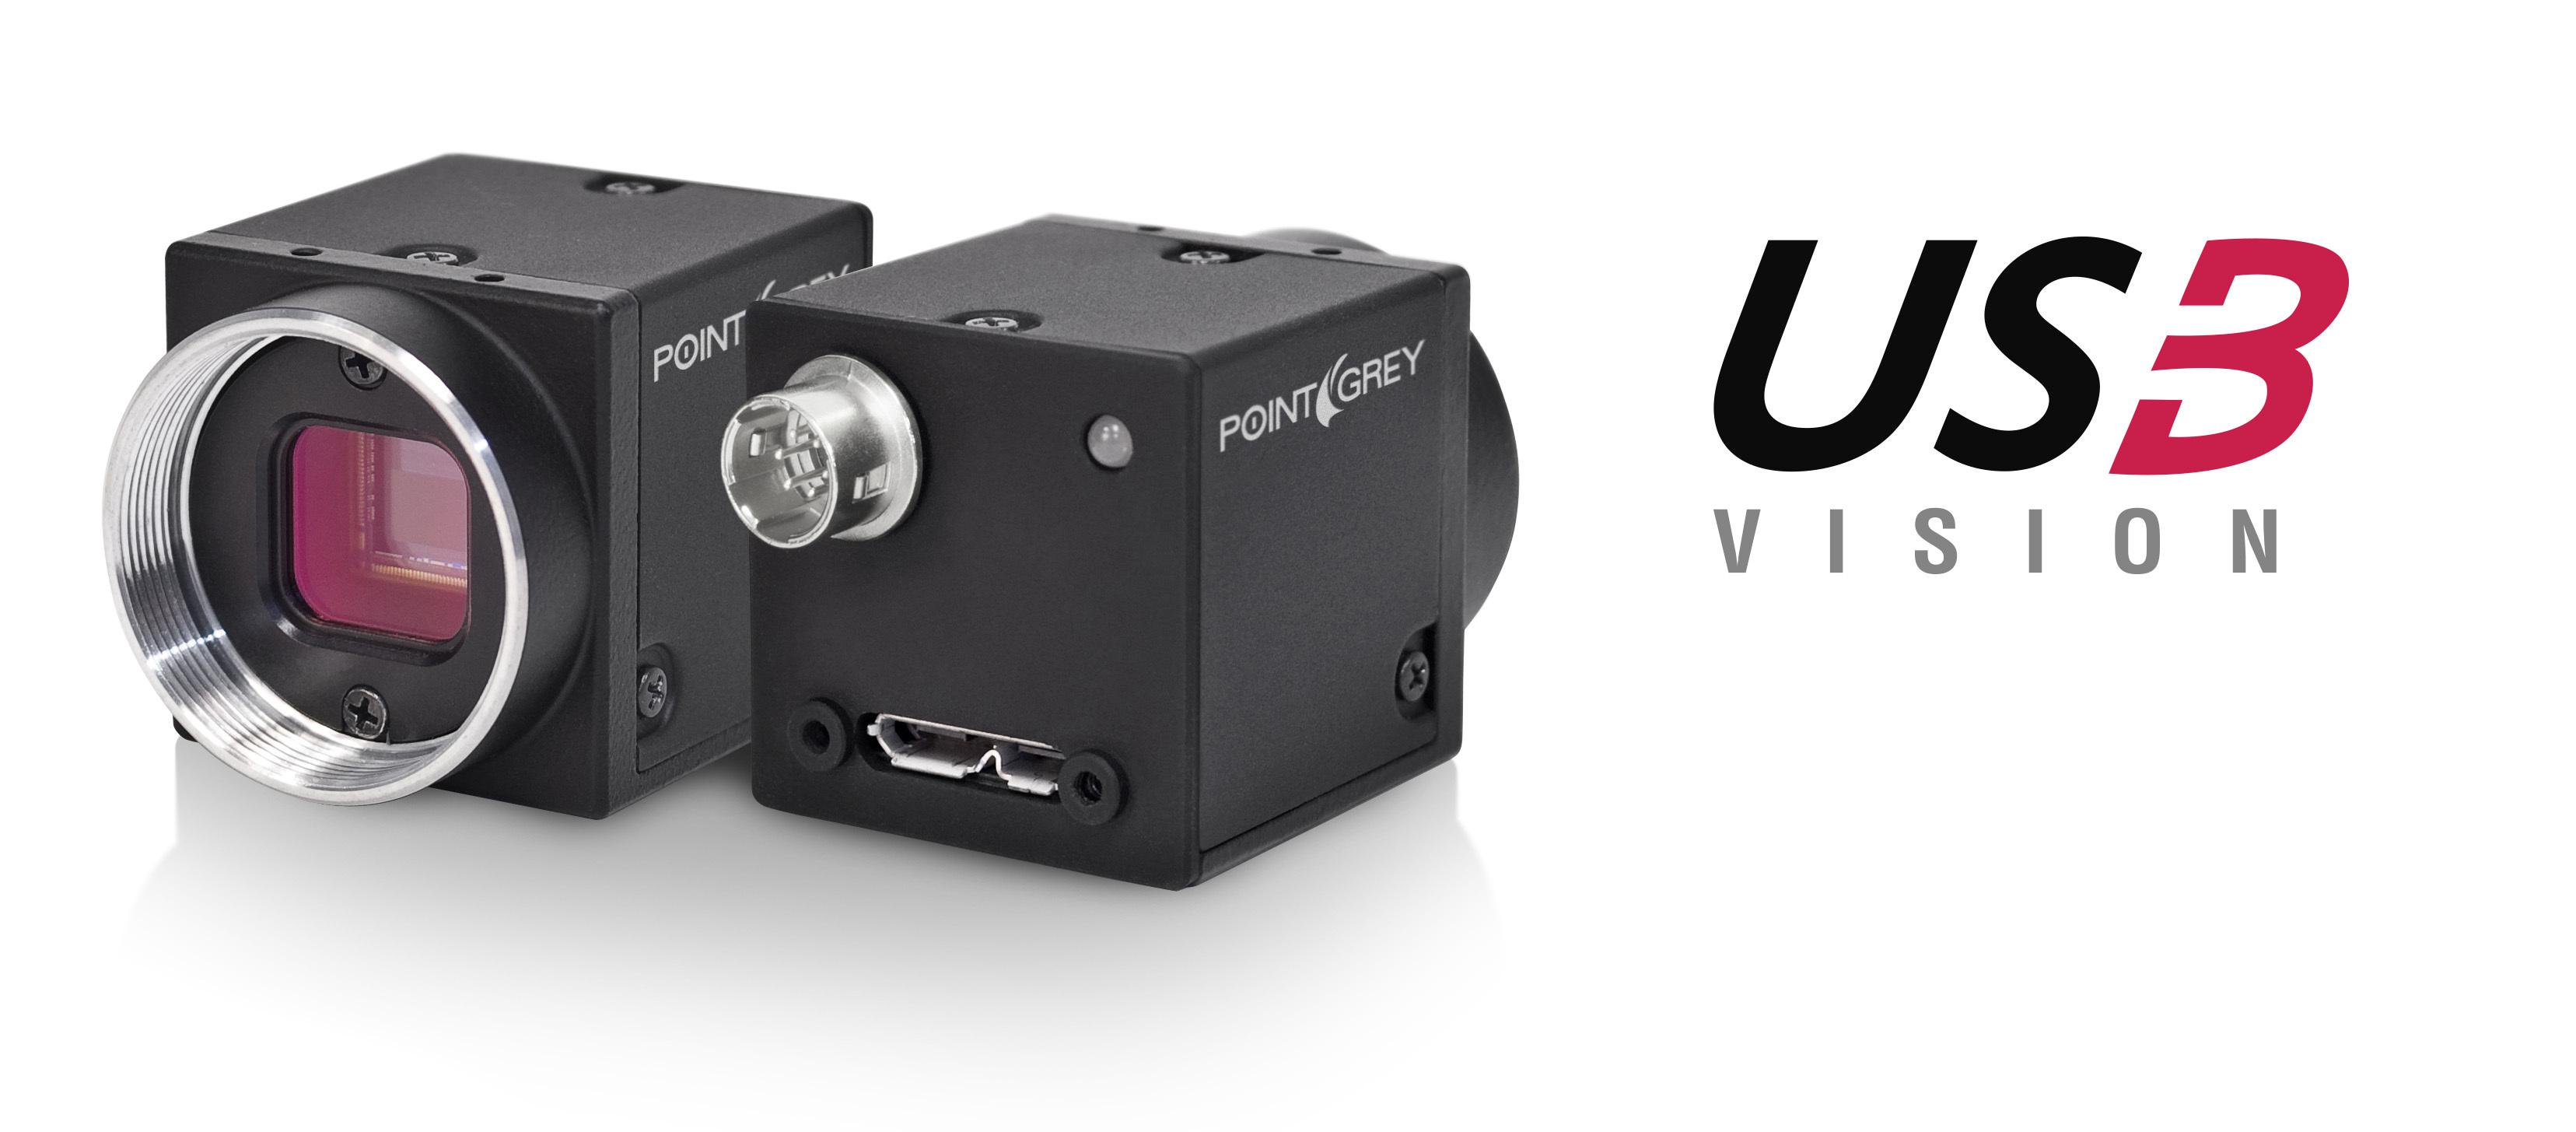 New Blackfly® USB3 Vision™ CCD Camera Family Provides Easy Interface